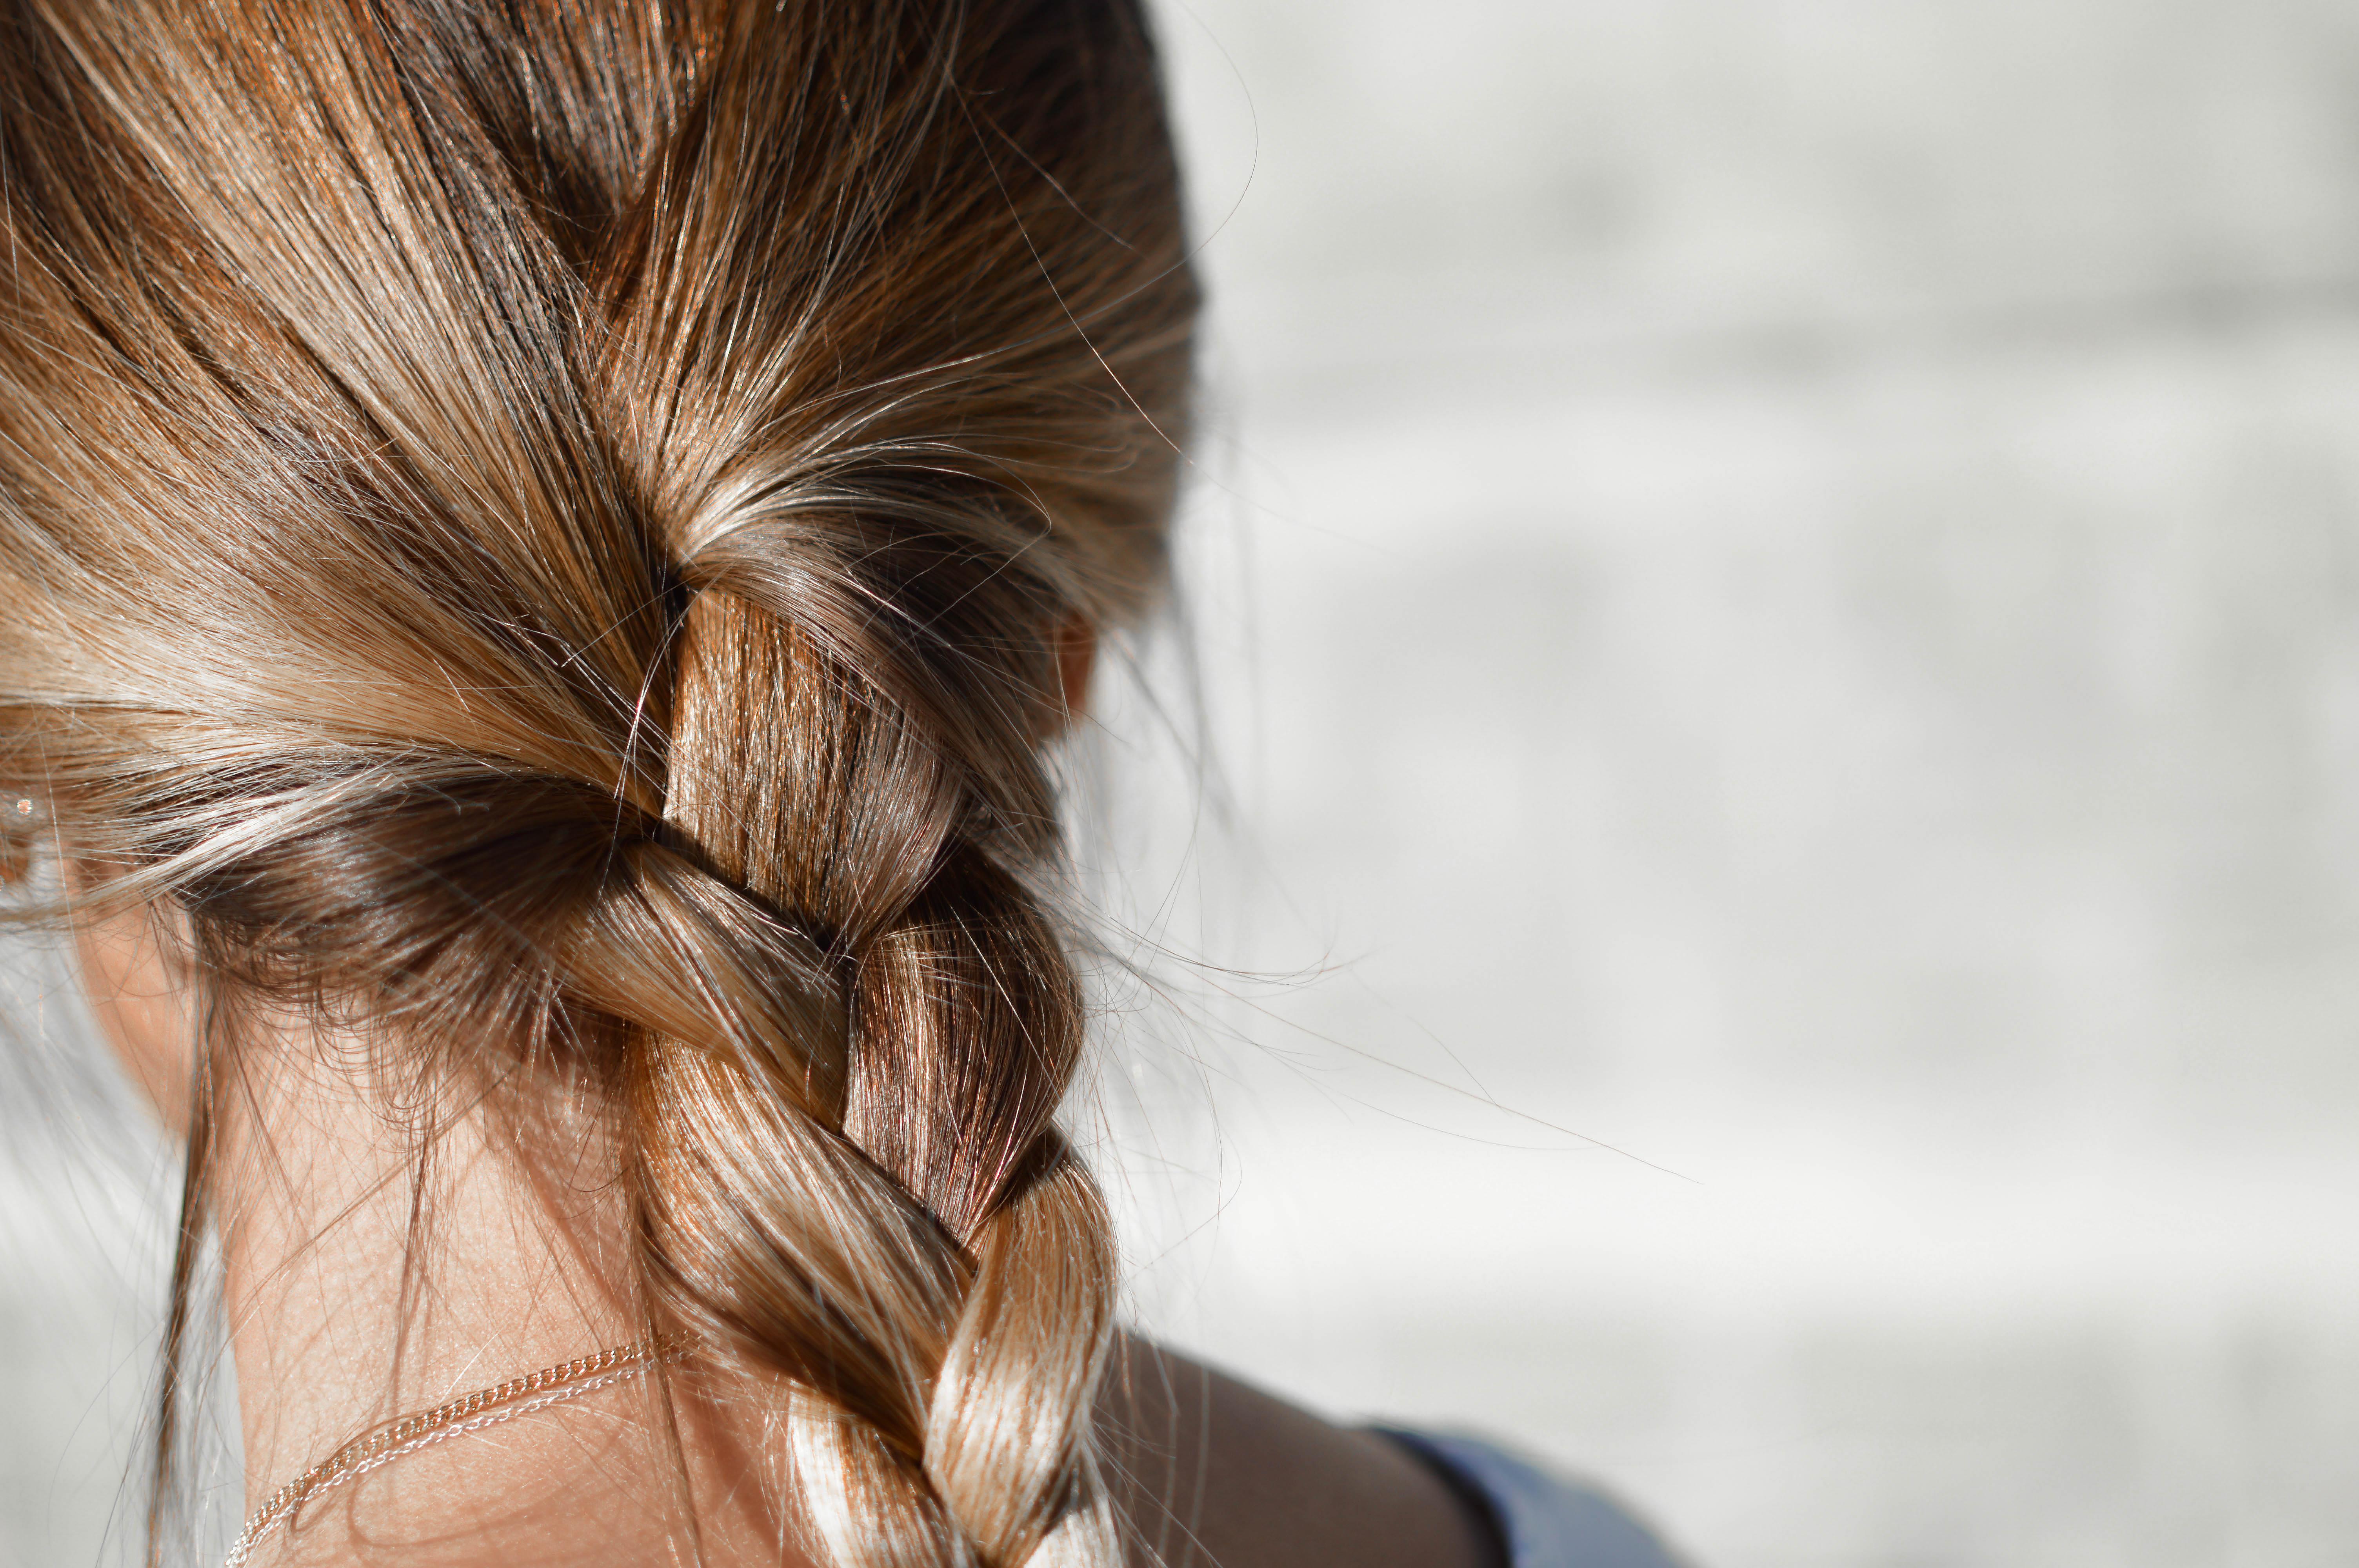 Acconciatura parrucchiere treccia